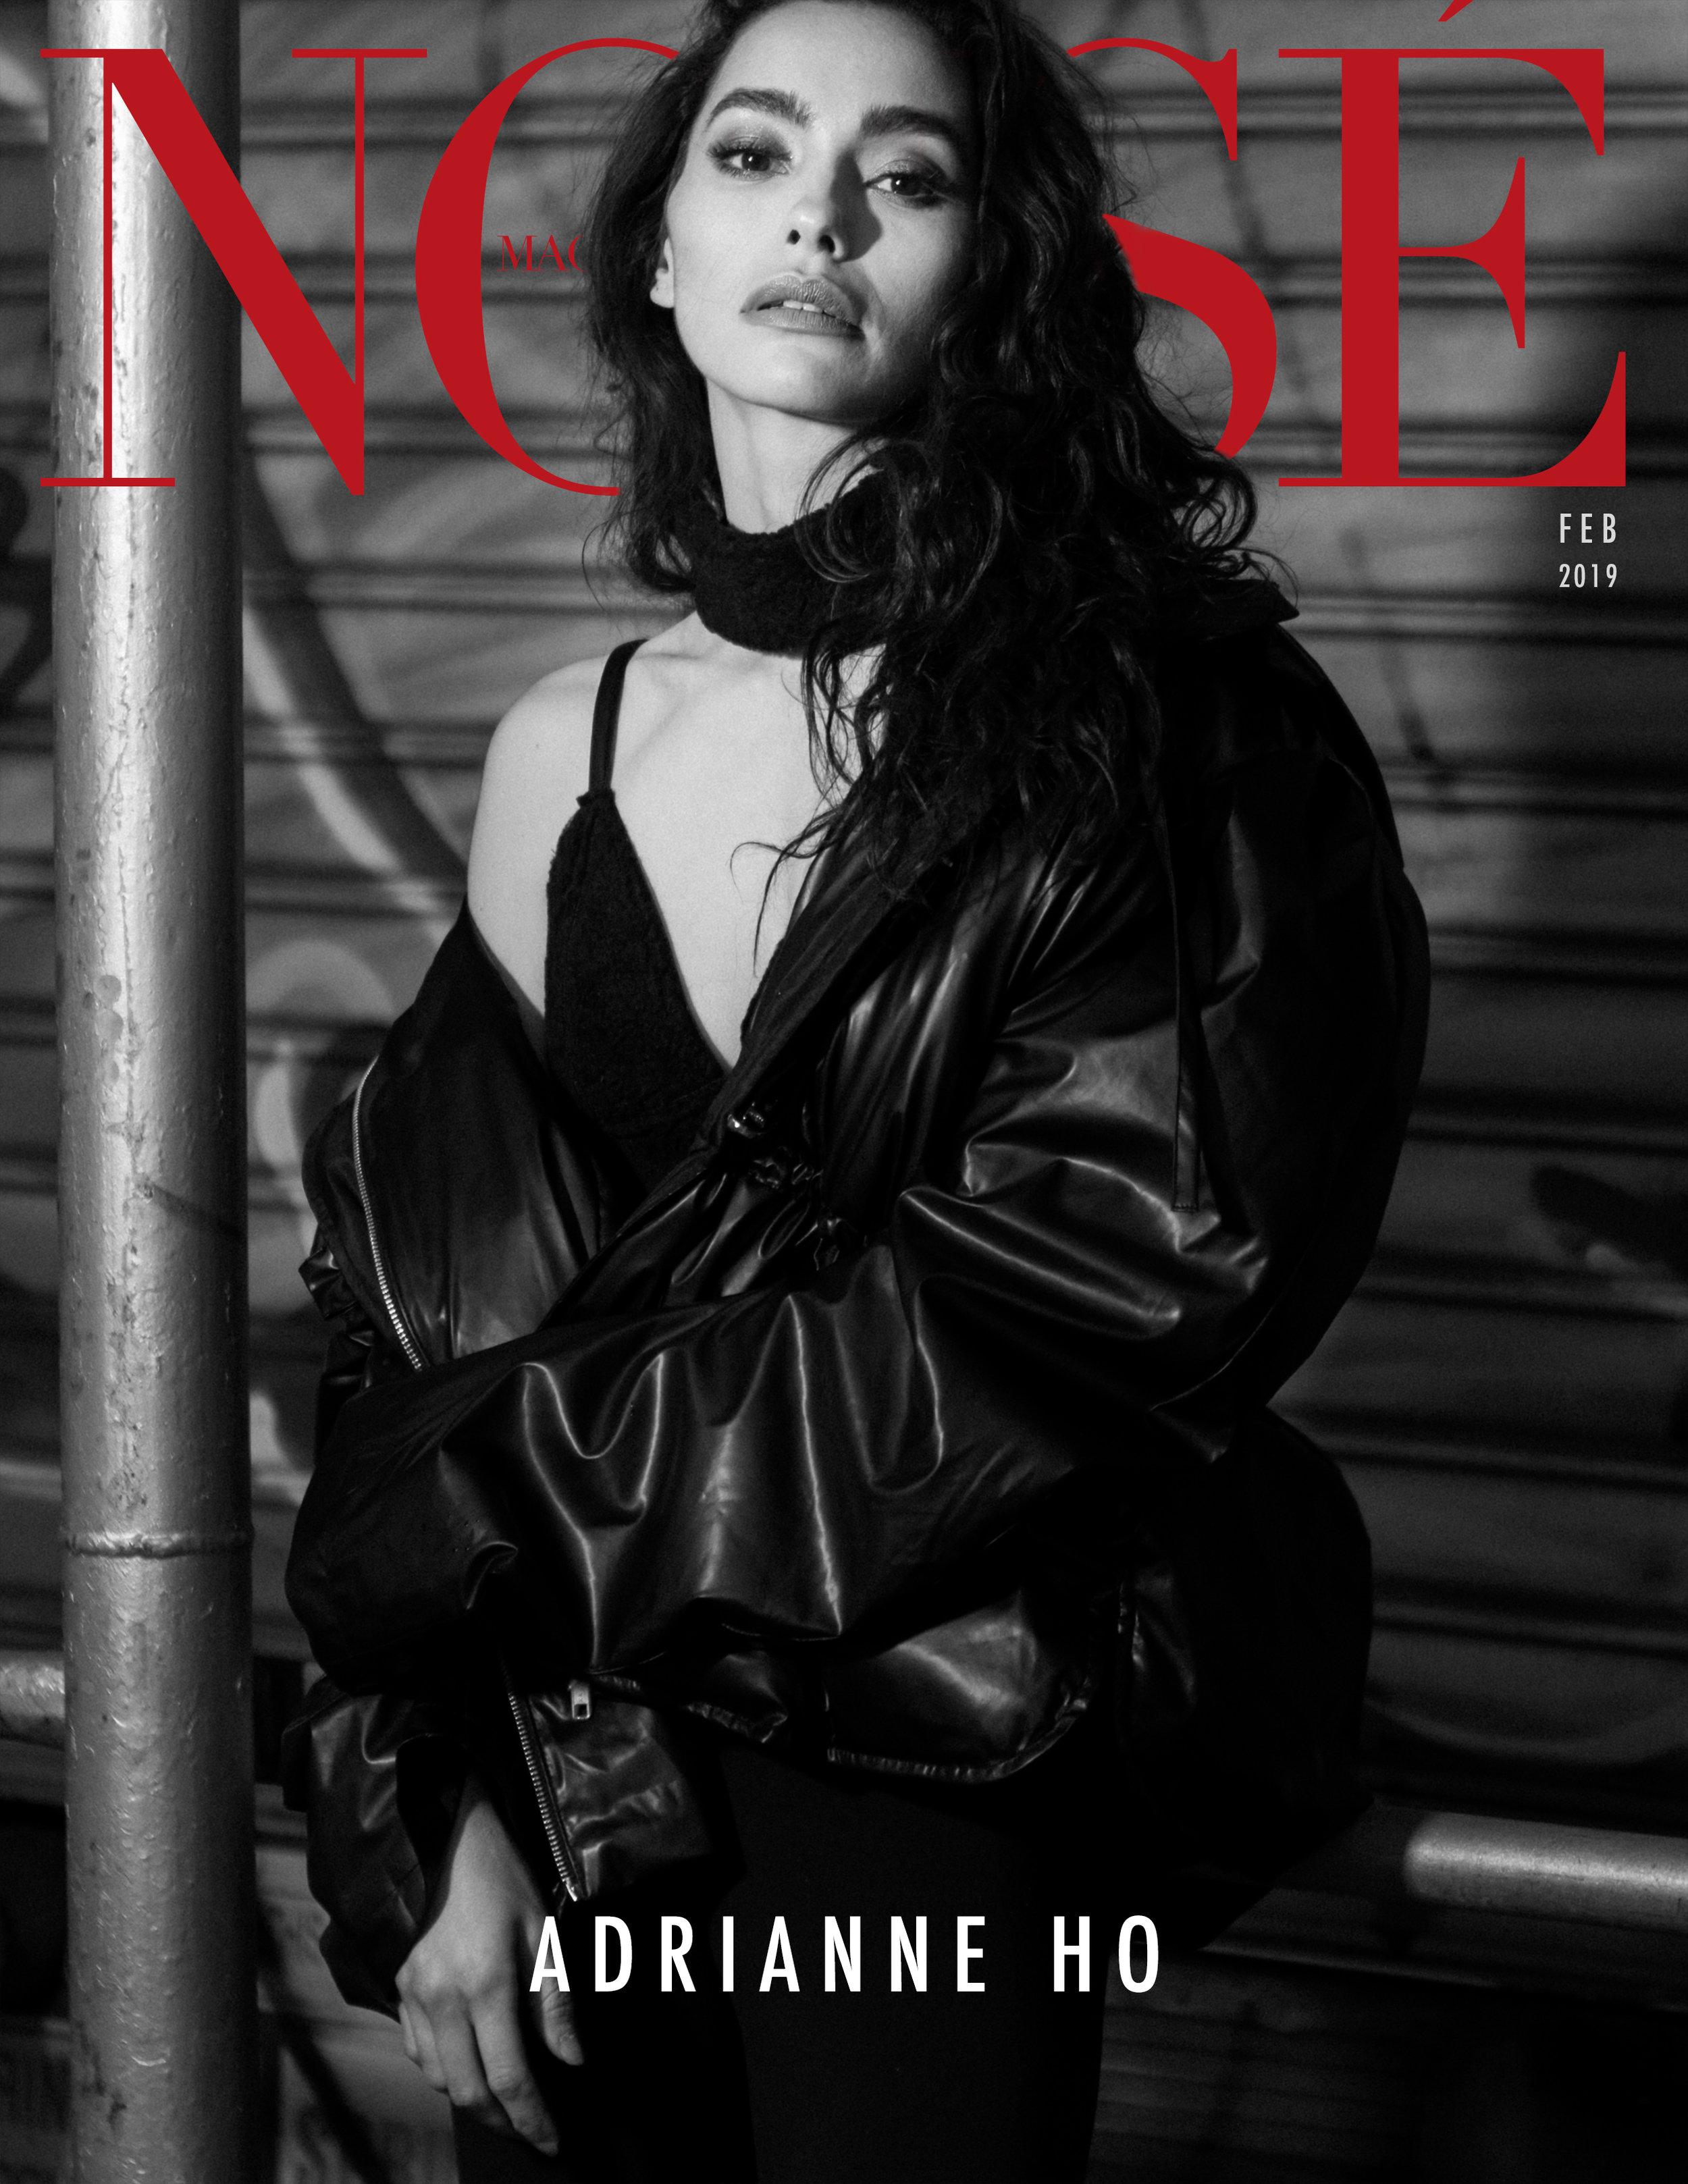 Adrianne Ho x NOISÉ magazine